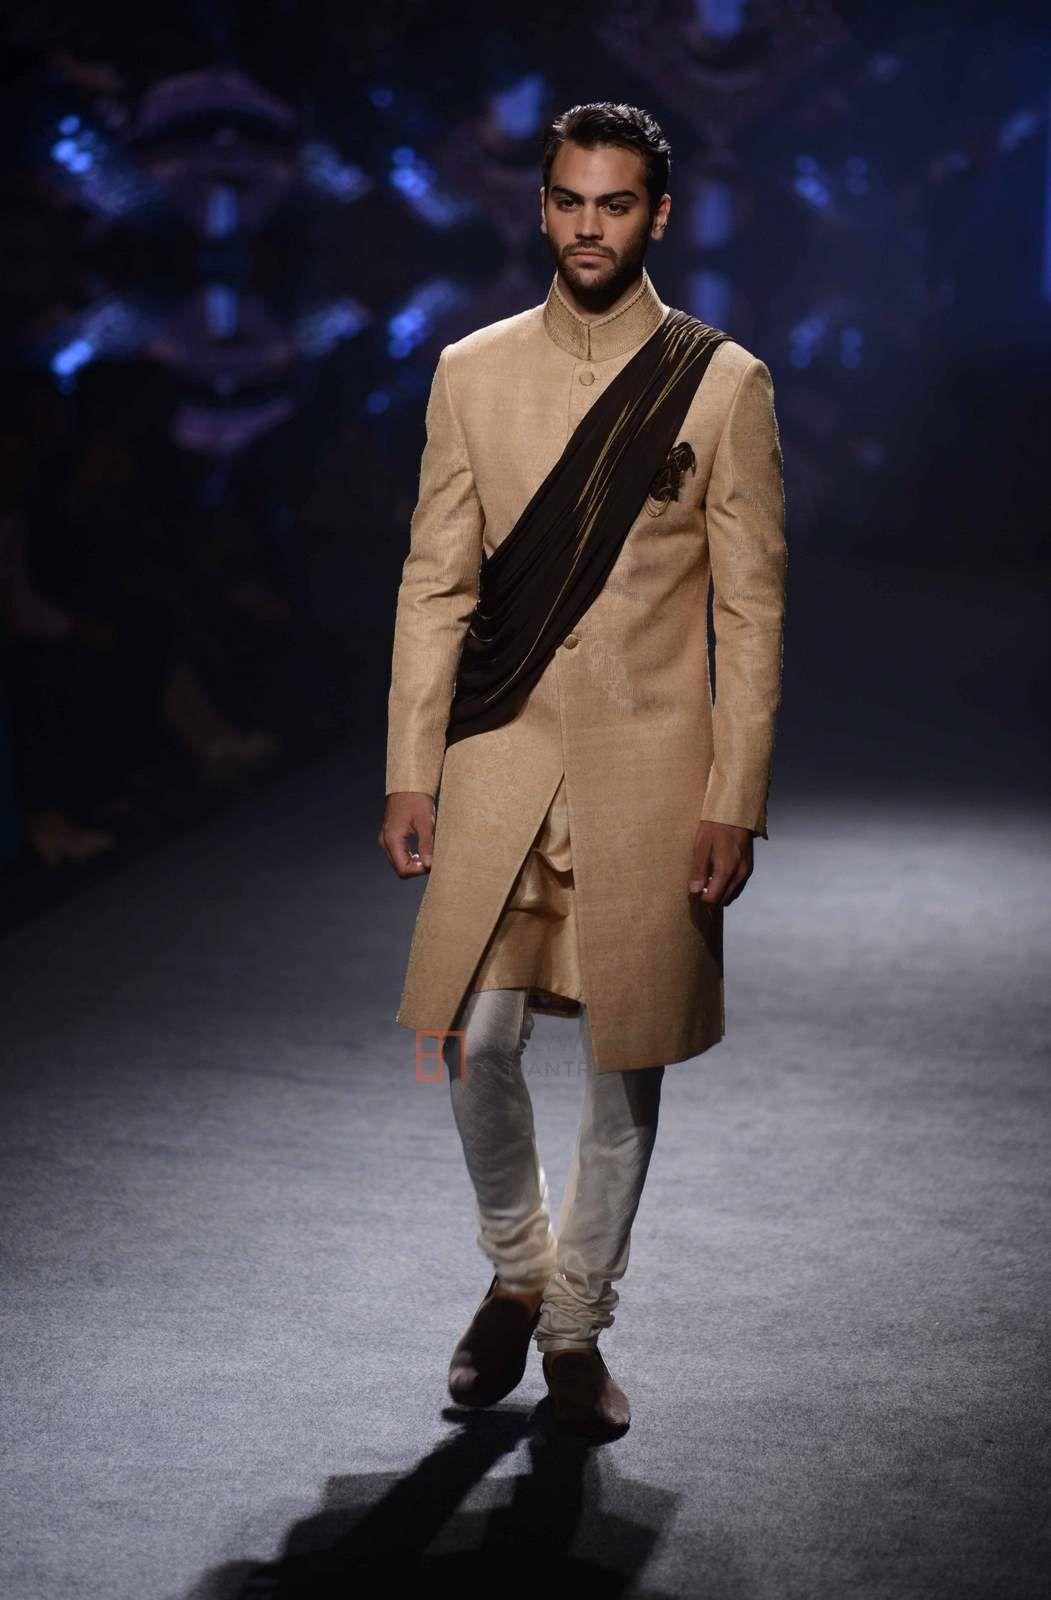 JJ Valaya – India Bridal Fashion Week 2015  #men #fashionformen #mennesslife #groomwear #ethnicwearformen #indinamen #realmen #menswear #men